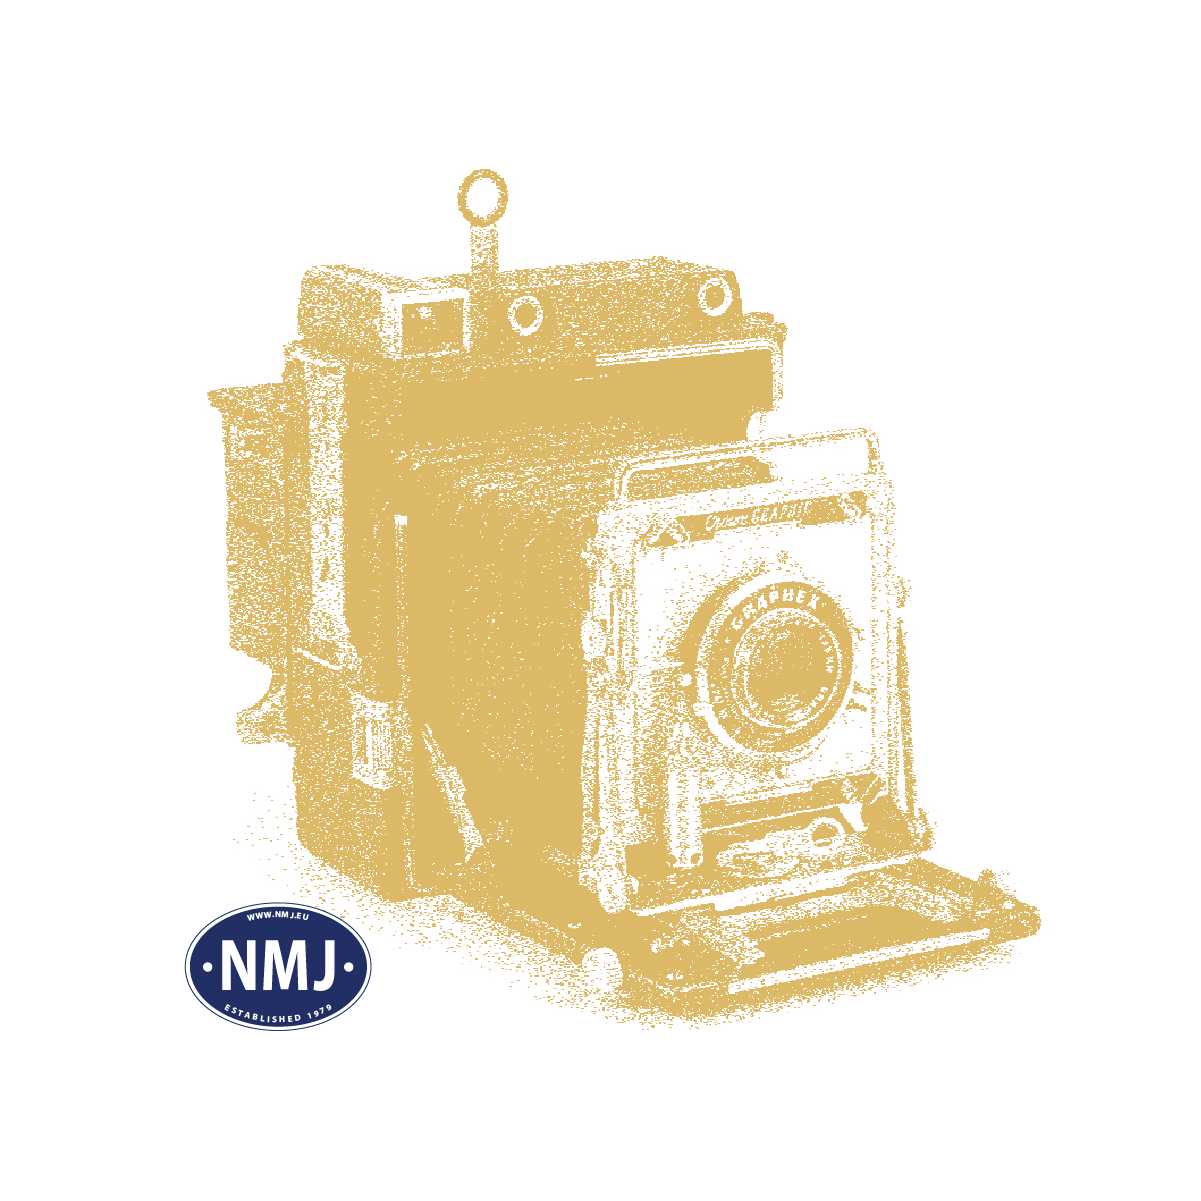 NOC15245 - Avskjed